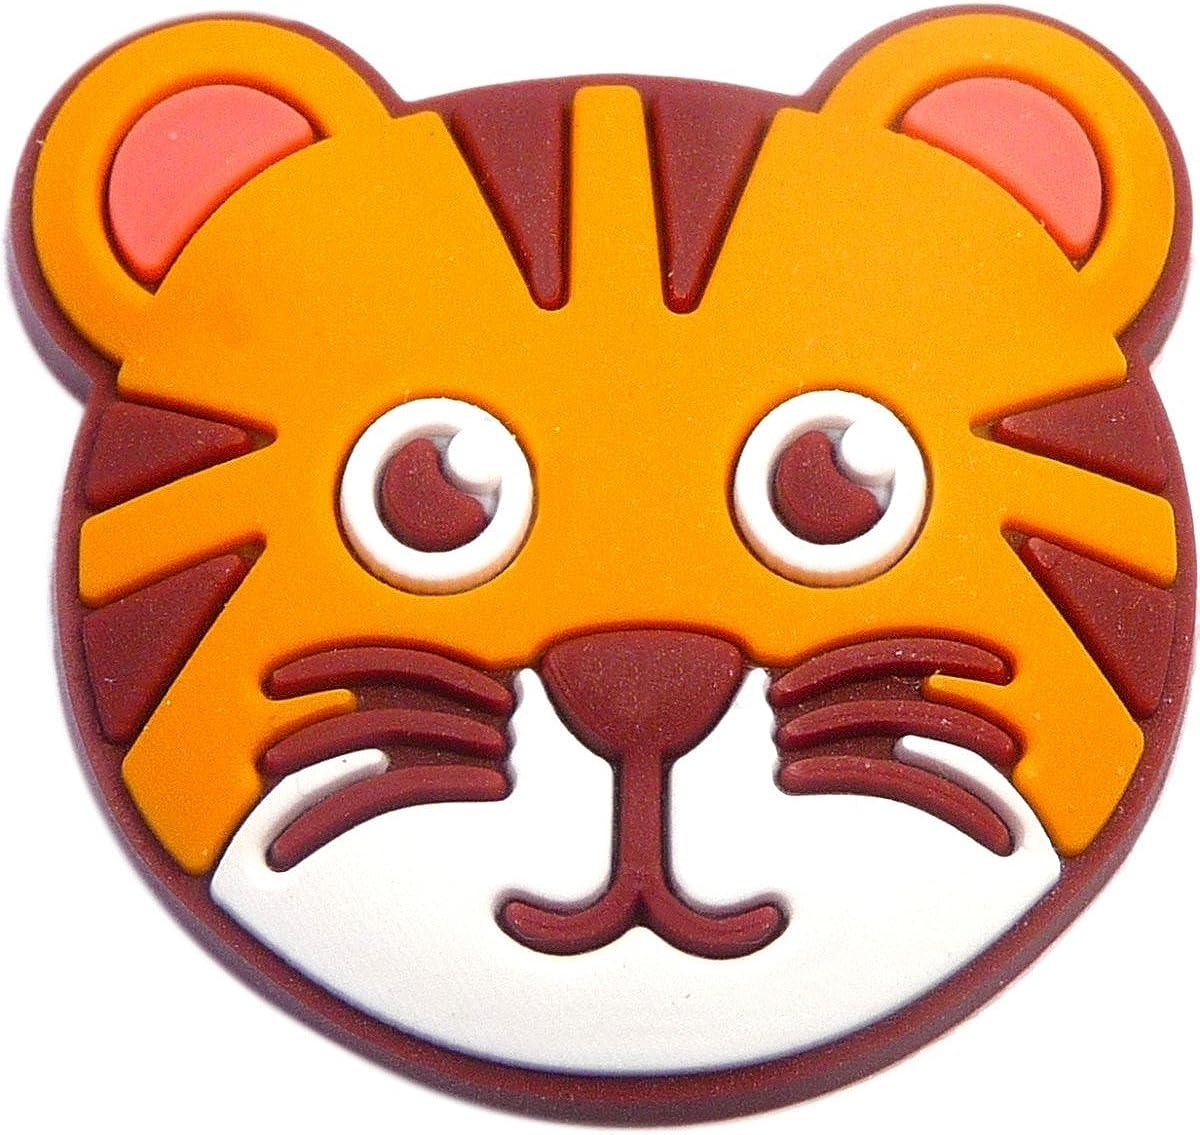 TIGER JIBBITZ TIGER SHOE CHARMS FITS CROCS TIGER CLOG CHARMS TIGER CHARMS